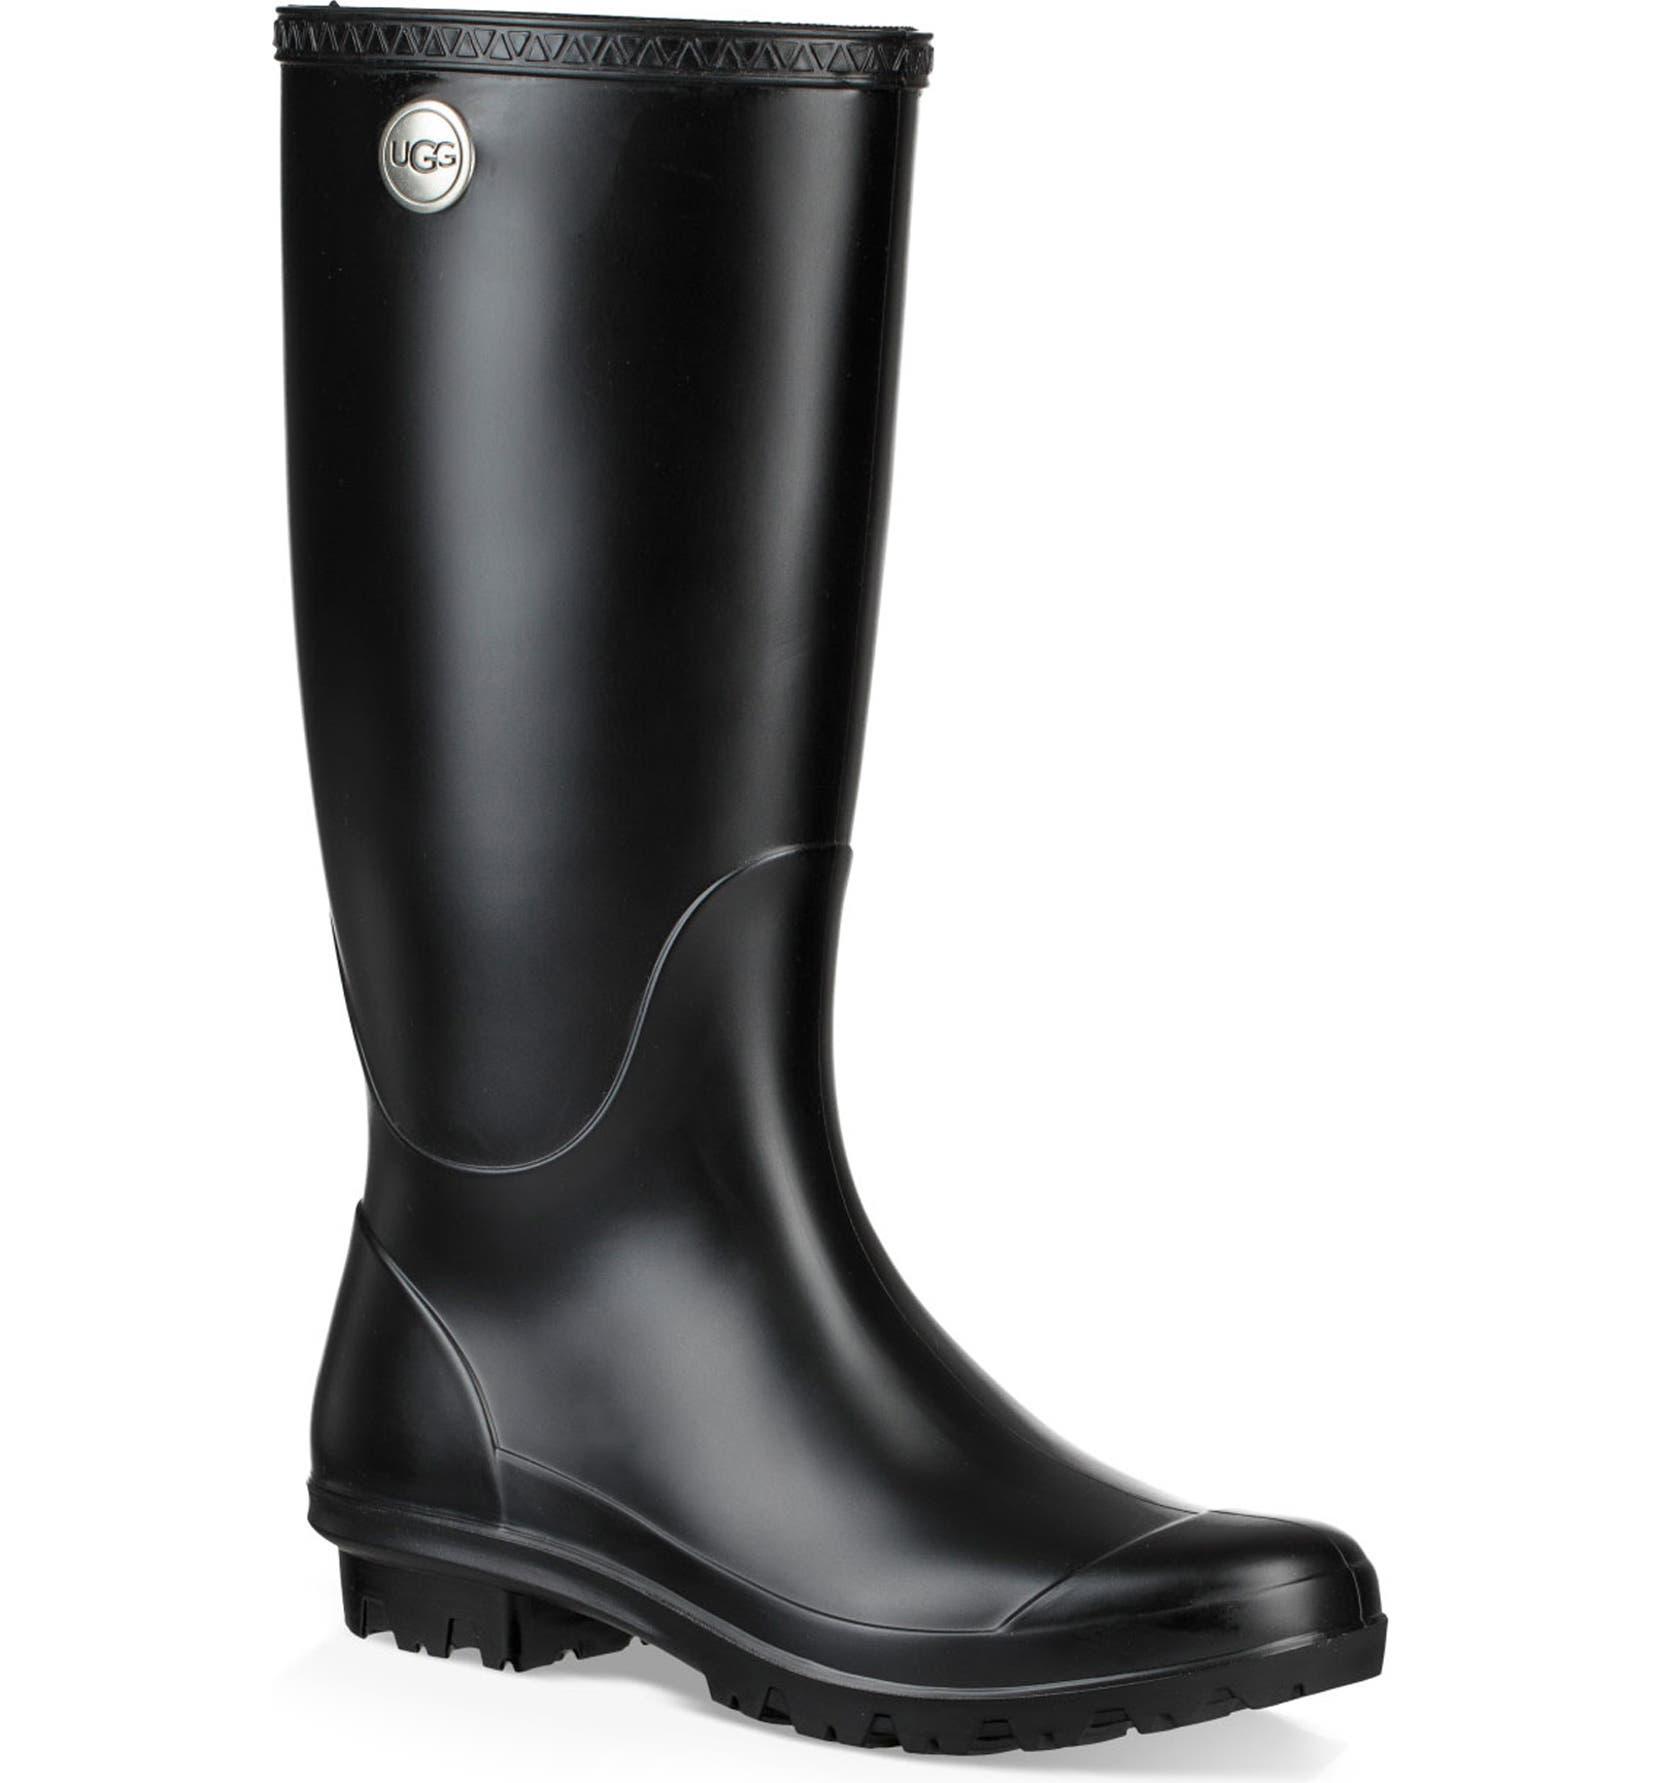 ugg boots on sale nordstrom